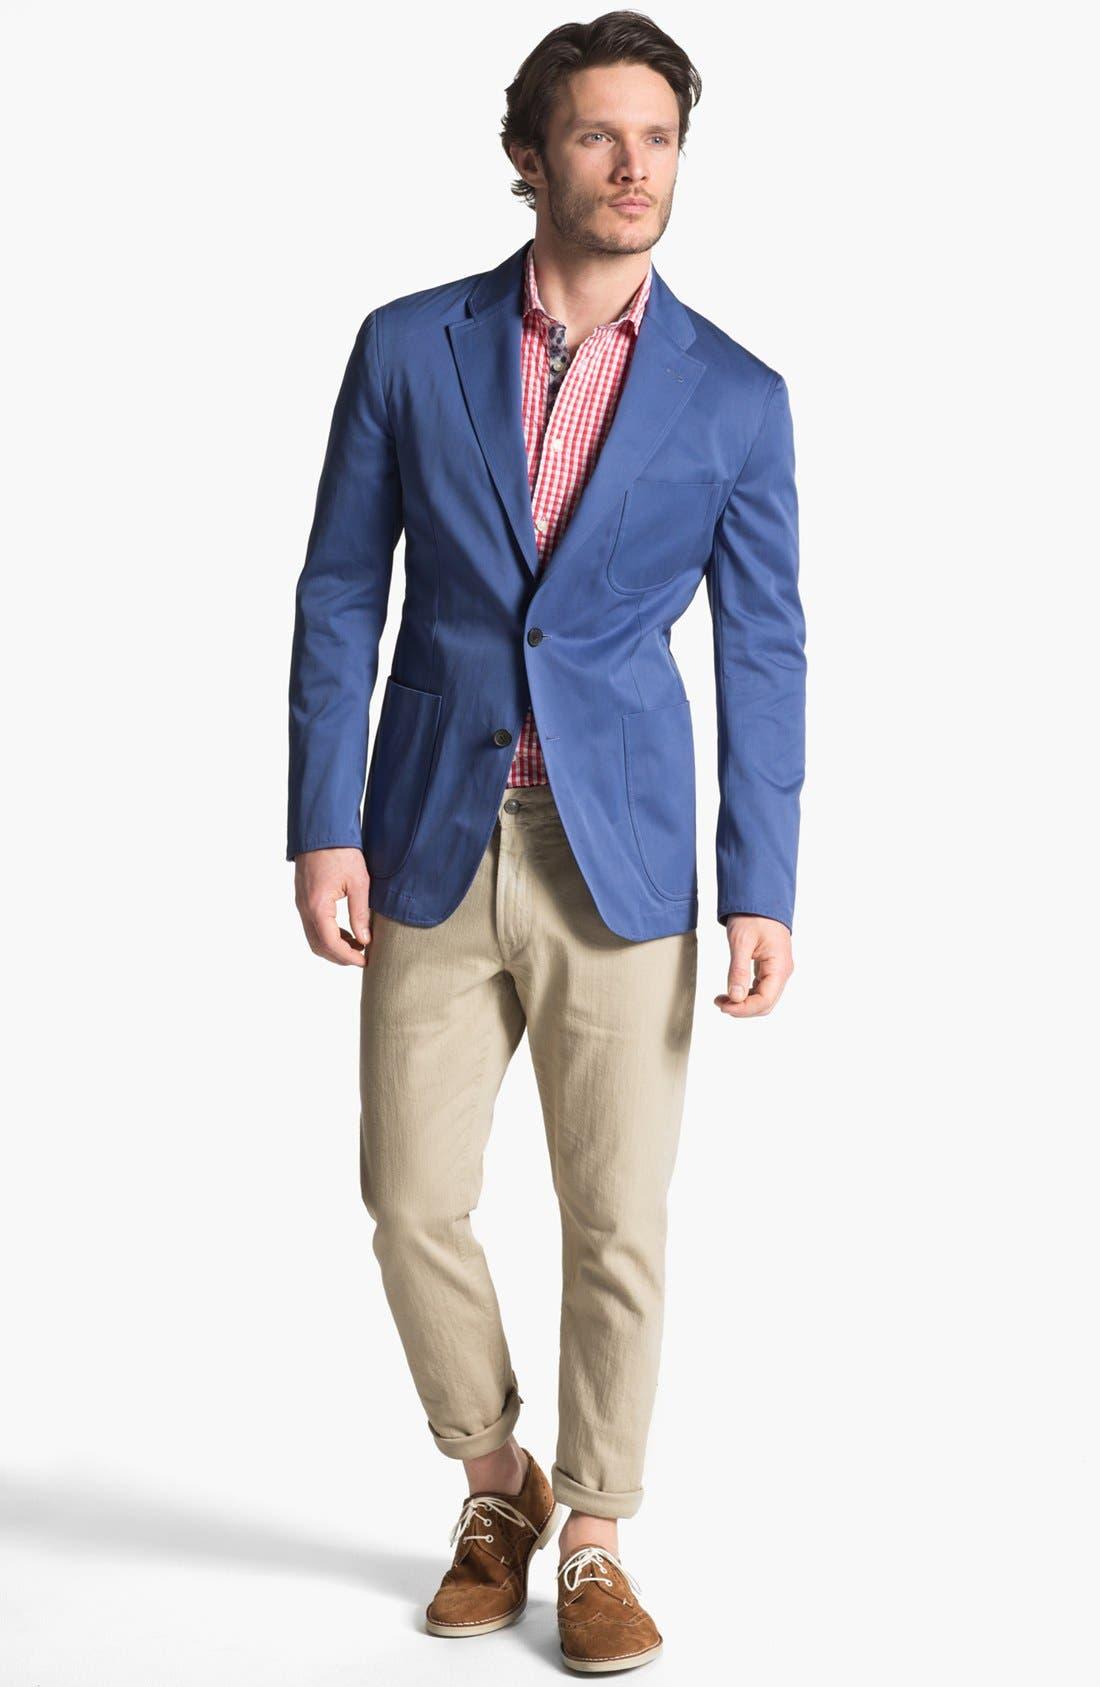 Alternate Image 1 Selected - Joseph Abboud Blazer, Thomas Dean Sport Shirt & Bonobos Jeans